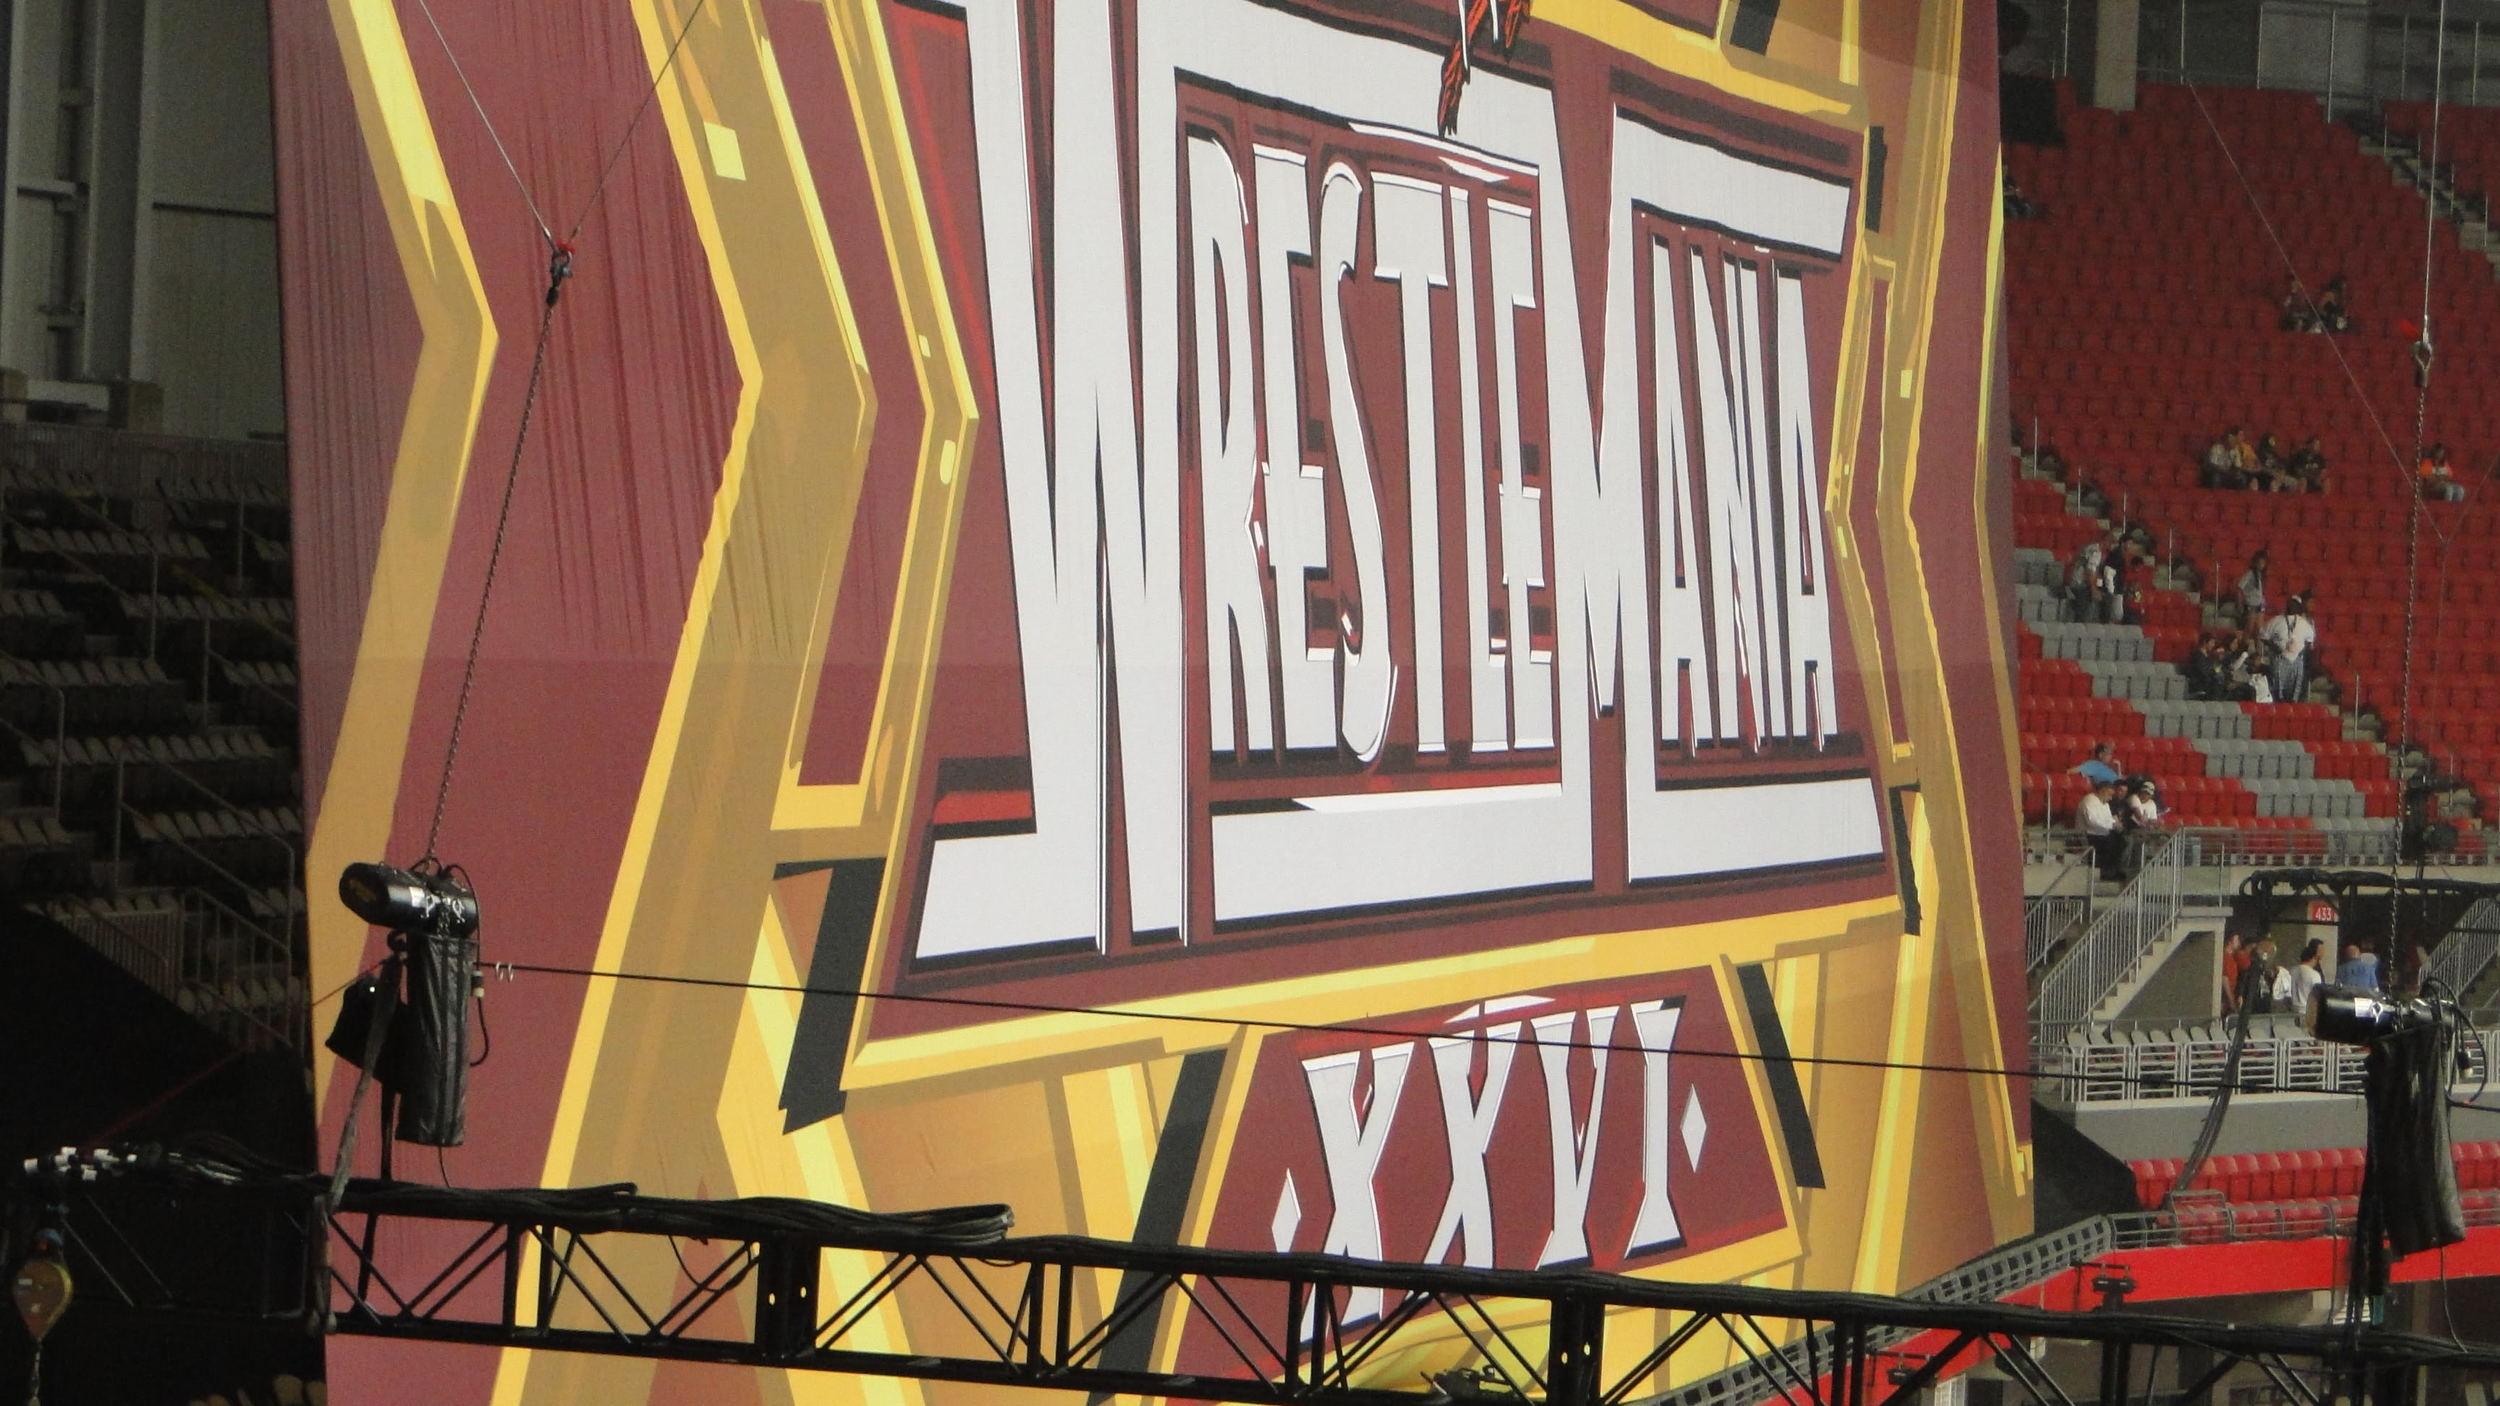 large-format-signage-wrestlemania.jpg